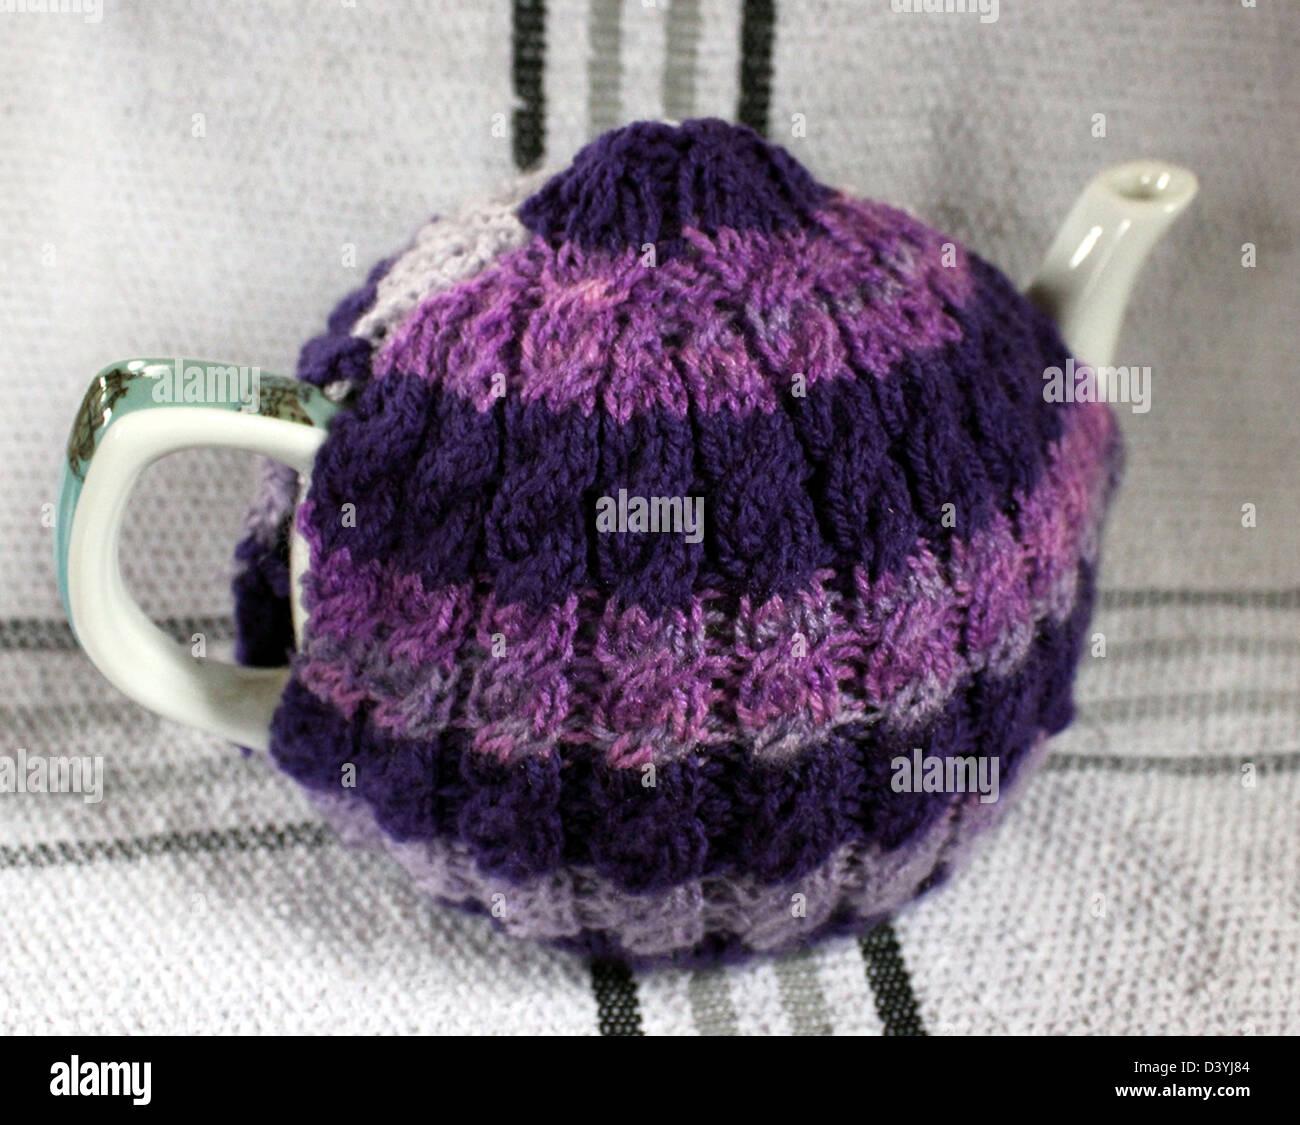 Stitch Pattern Stockfotos & Stitch Pattern Bilder - Alamy